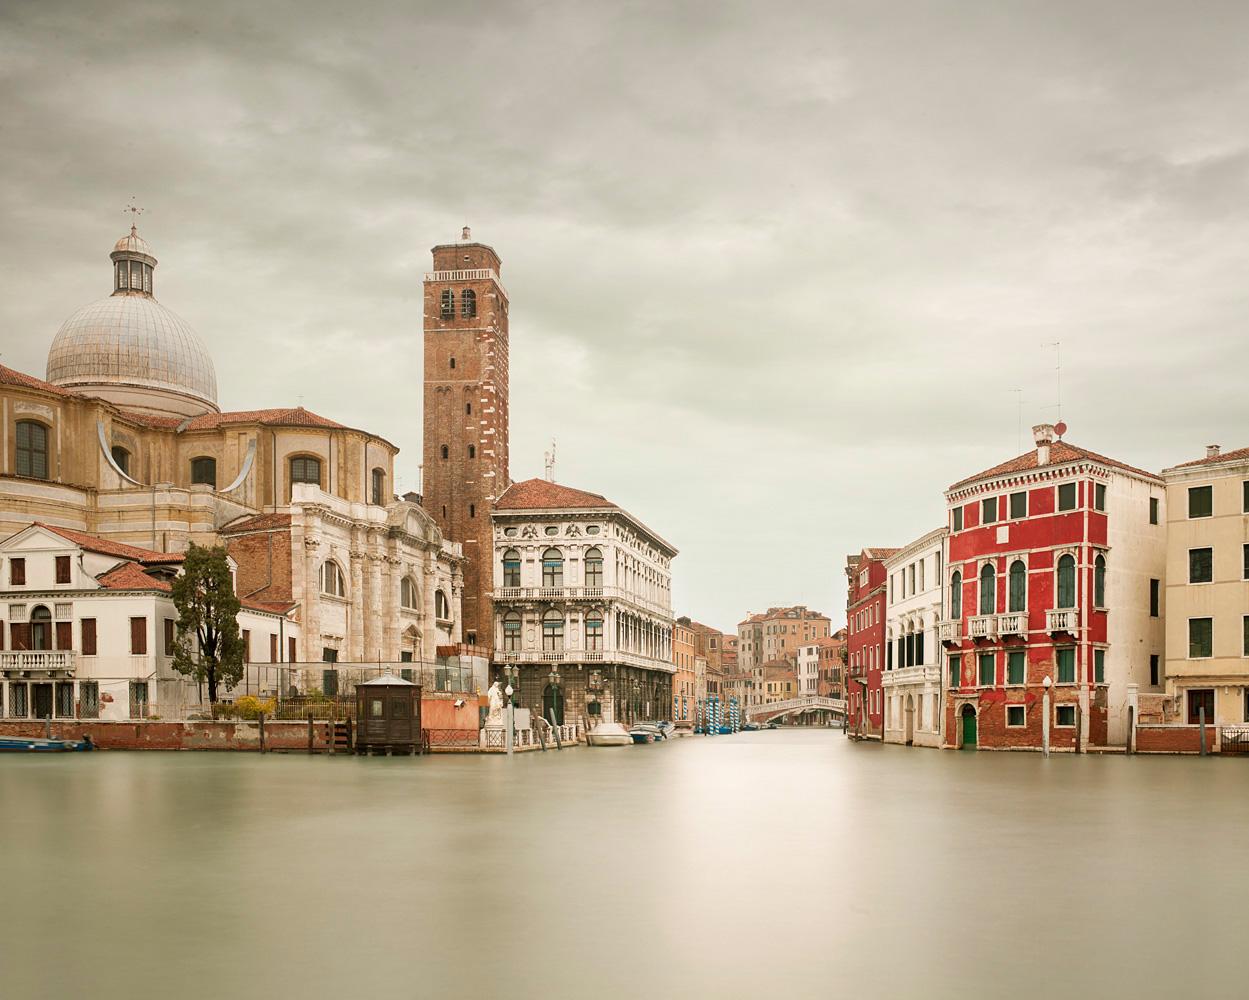 San Geremia, Palazzo Labia on the Grand Canal, Venice, 2012